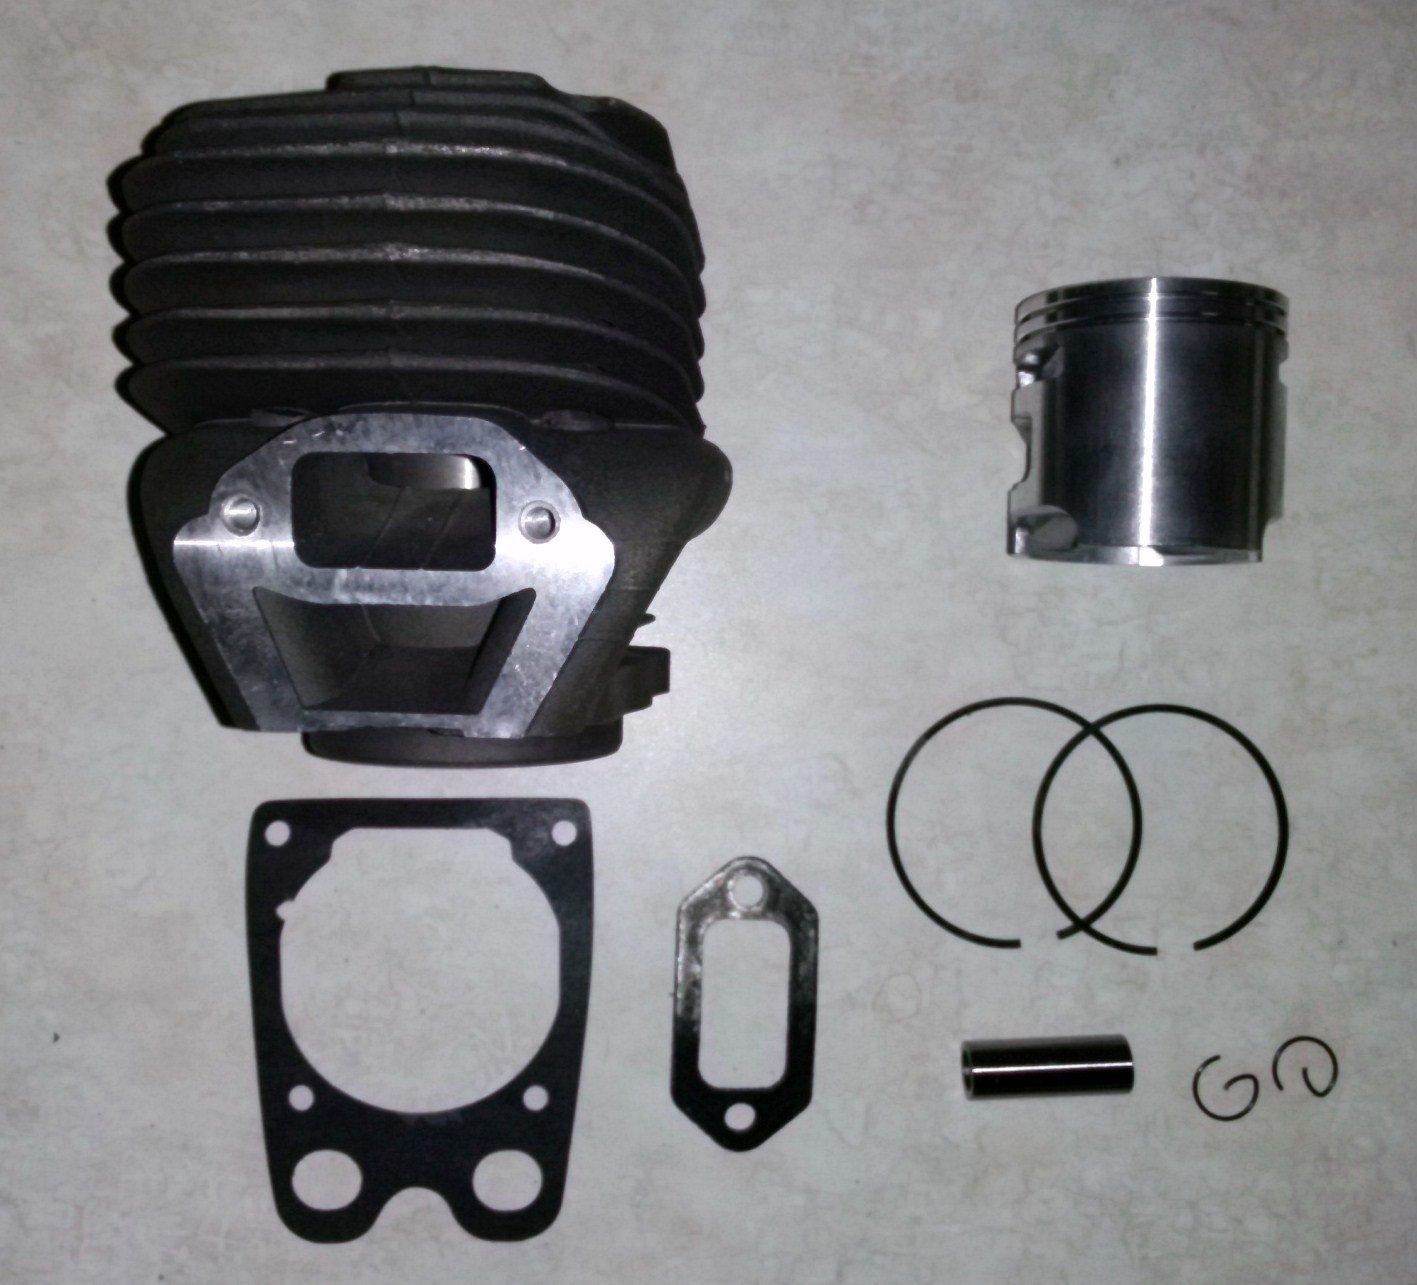 Partner Husqvarna Cylinder Piston Rings K750 K760 Cut Off Concrete Chop Saw 51MM Replaces 506386171